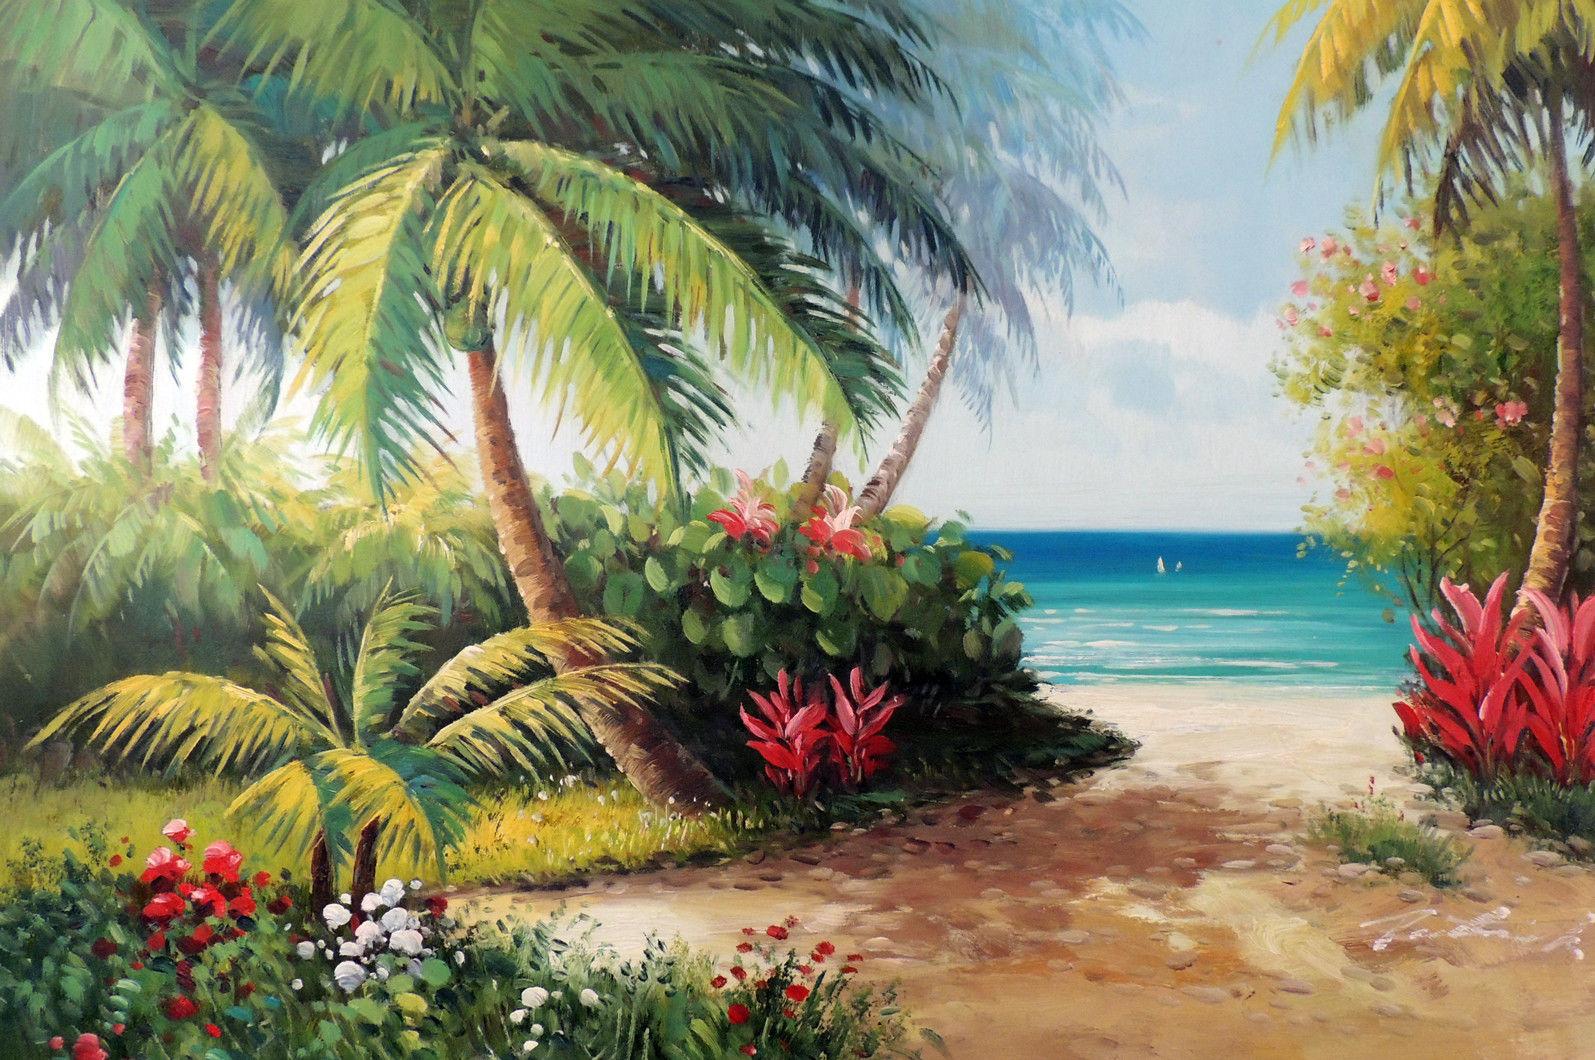 Beach-Island-Flowers-Coconut-Palm-Trees-